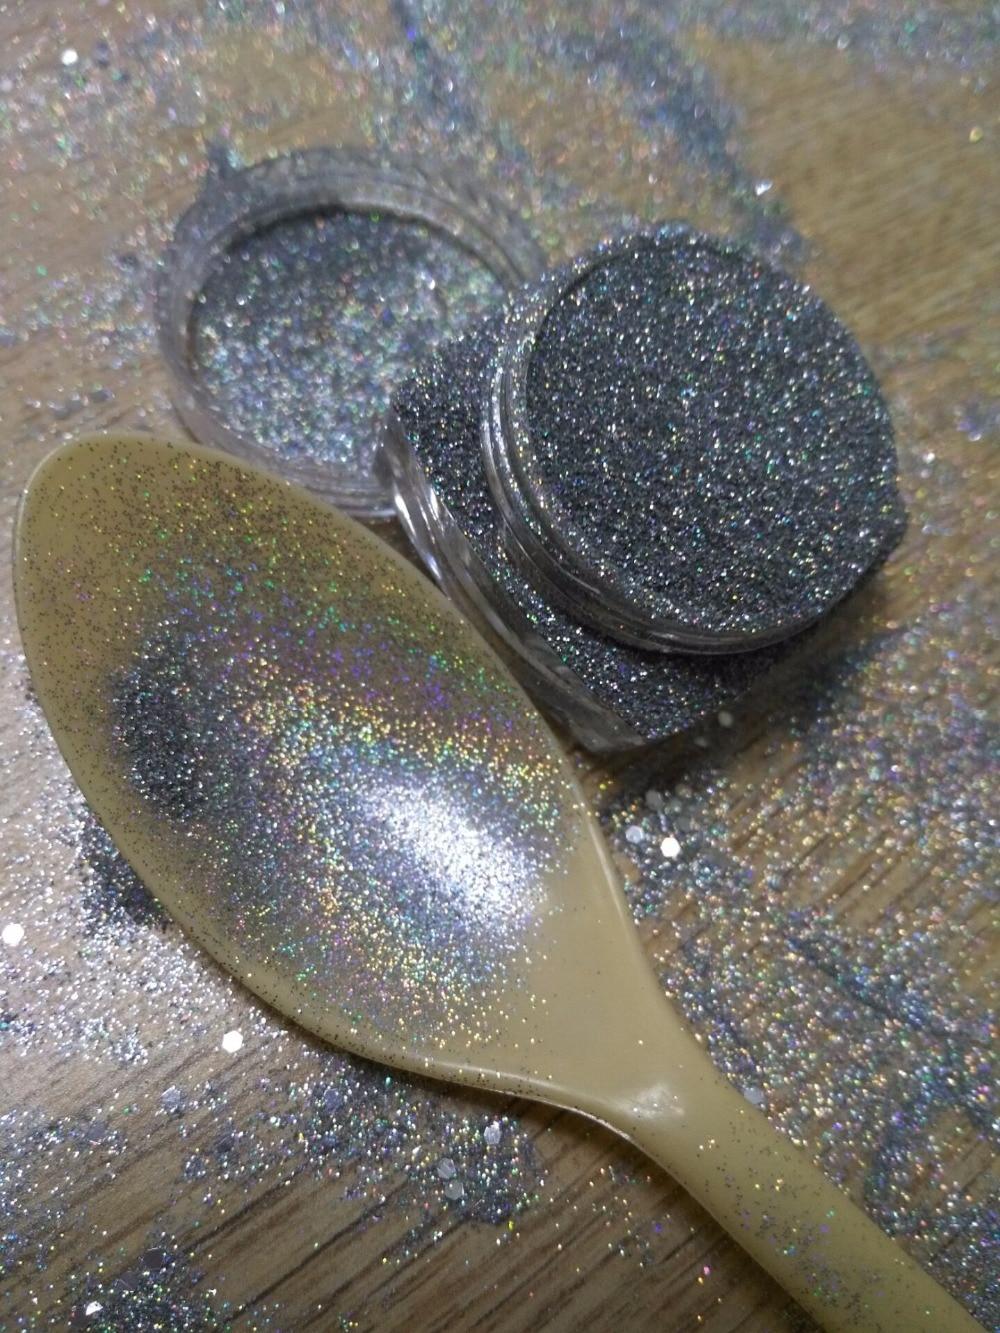 Zielstrebig 5 Gr/schachtel Holographische Nagel Glitter Pulver Nail Art Holo Glitters Pulver Staub Shinny Gold Splitter Nail Art Dekorationen Set Nagelglitzer